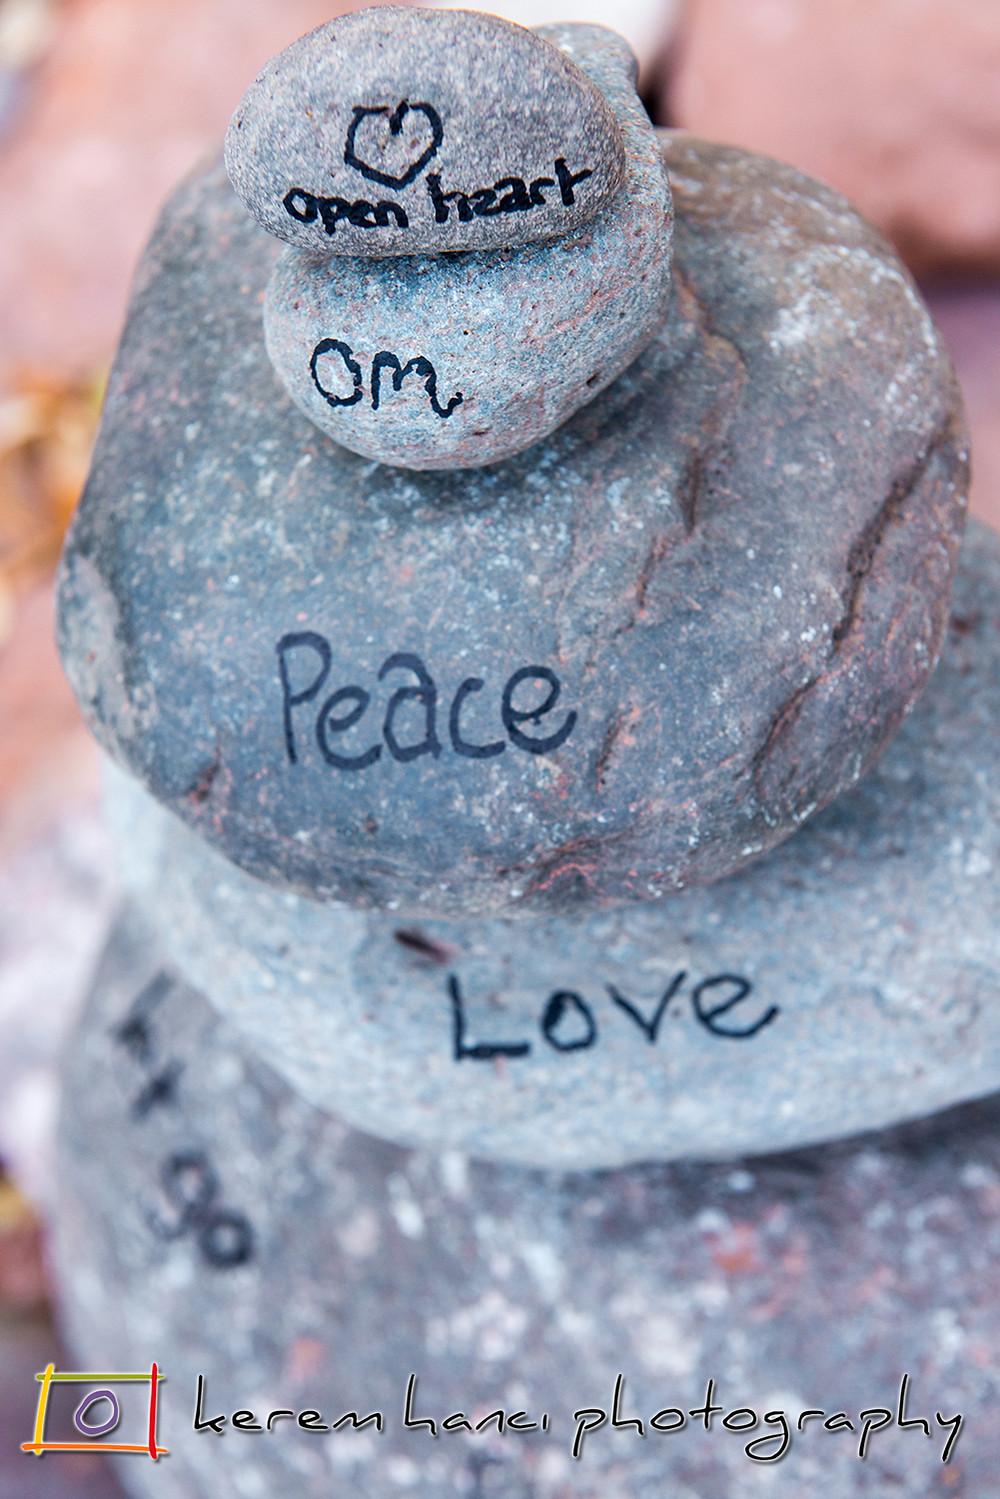 Rock Balancing and Sharpie Messaging